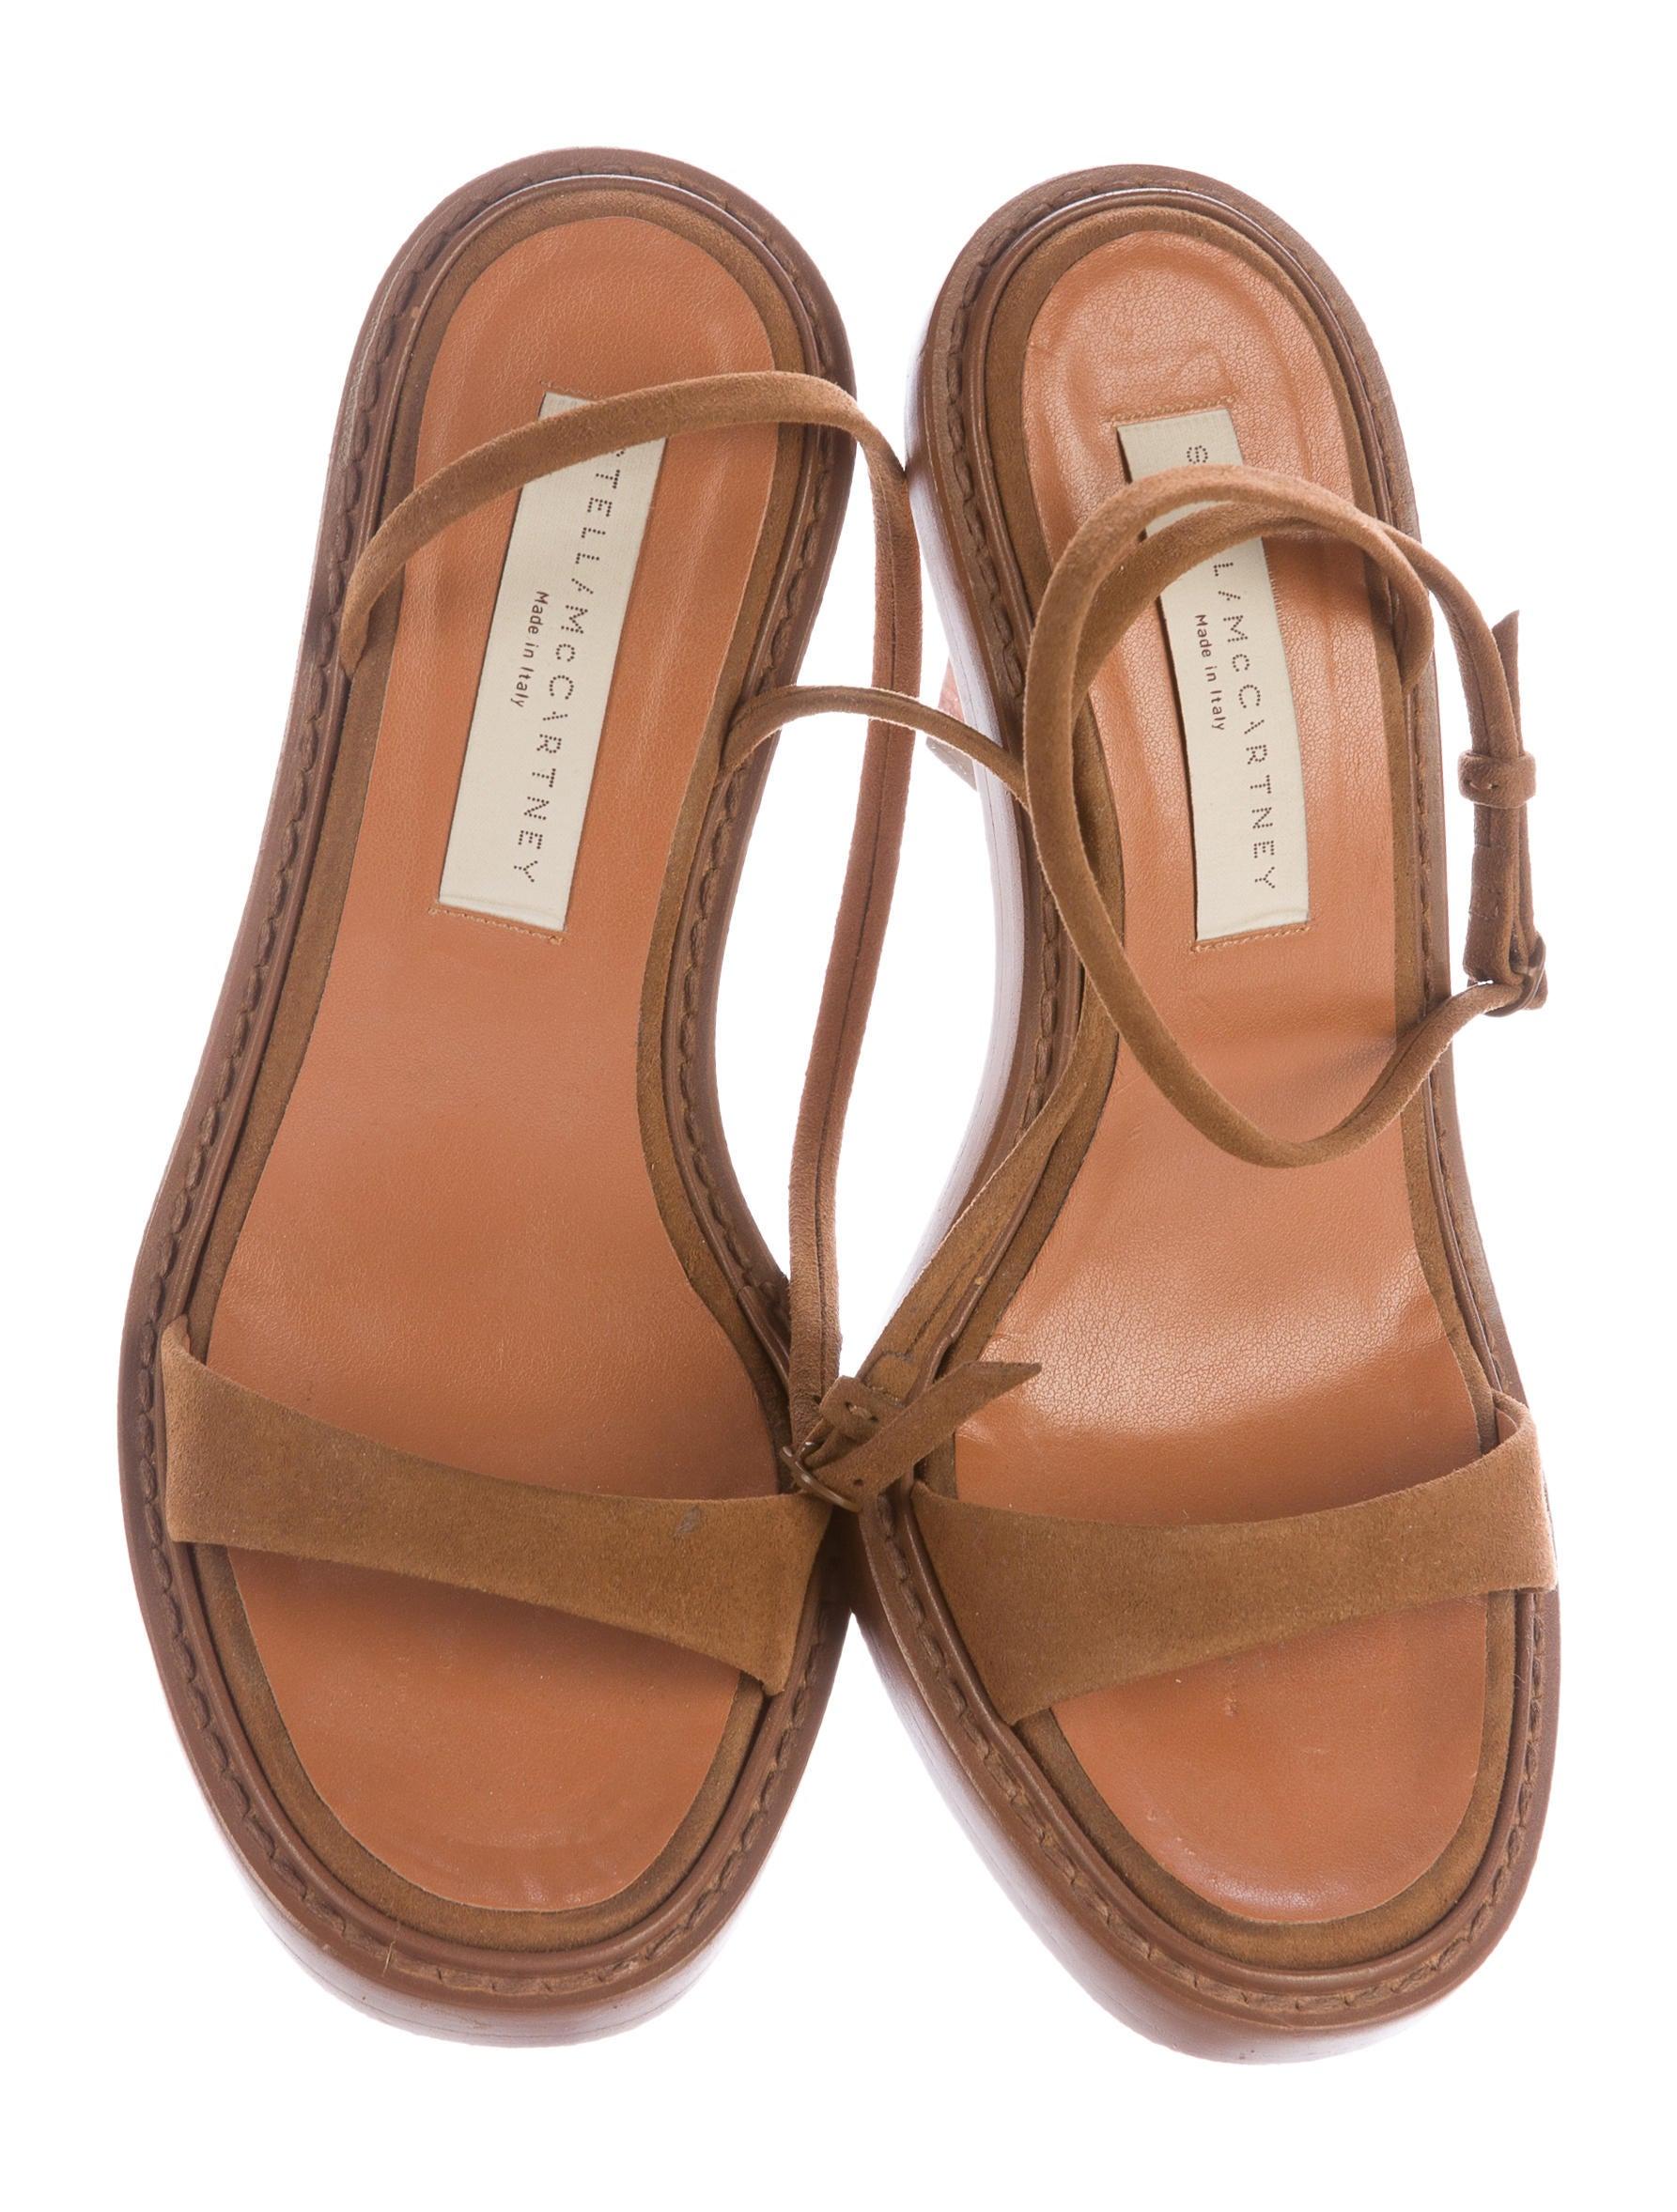 596817e3c4f Stella McCartney Vegan Suede Ankle Strap Sandals - Shoes .